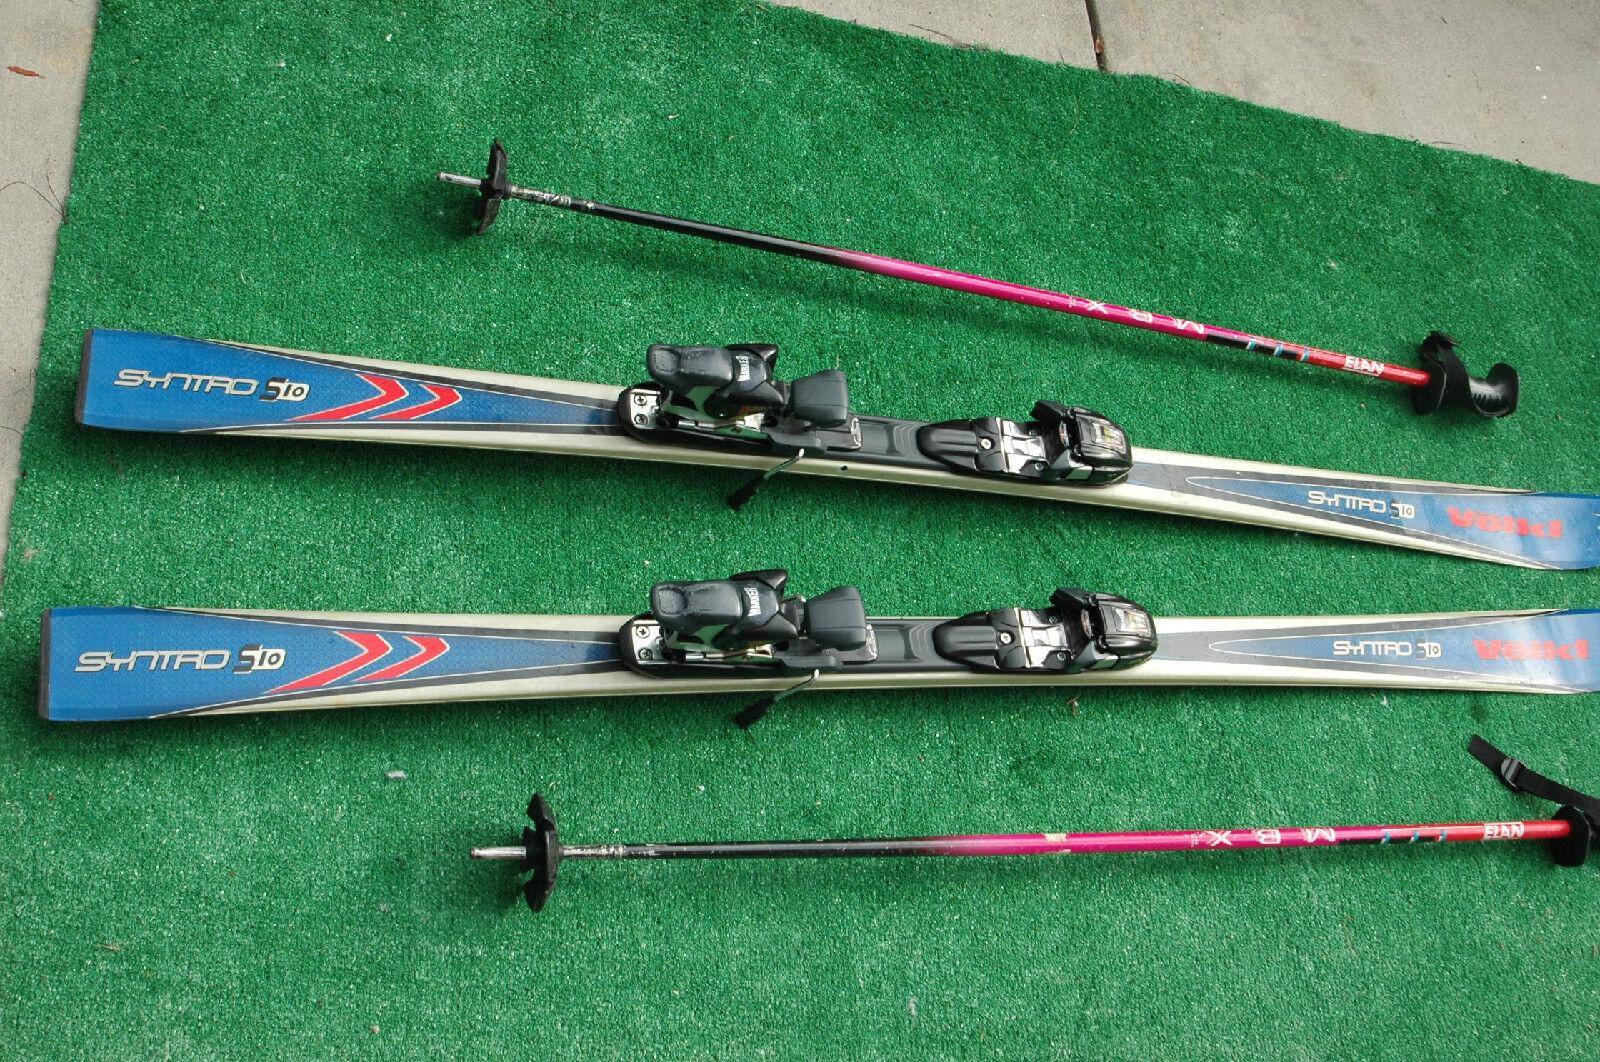 Volkl Syntro S10 Skis 170 509541 67  Marker Binding sz 4-12 & 50  Elan FSS Poles